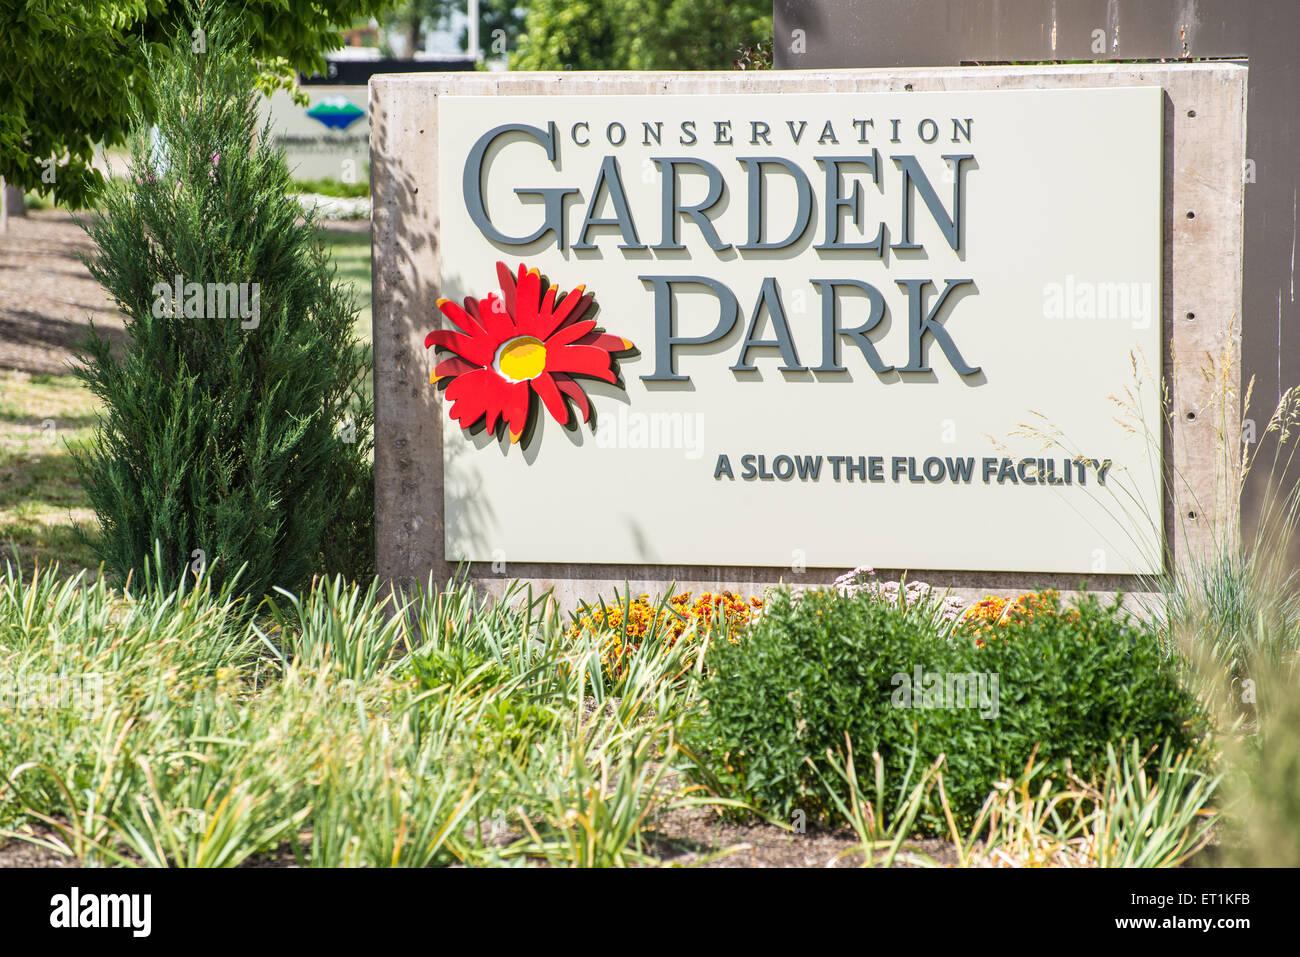 Exceptionnel West Jordan Conservation Garden Park, Utah